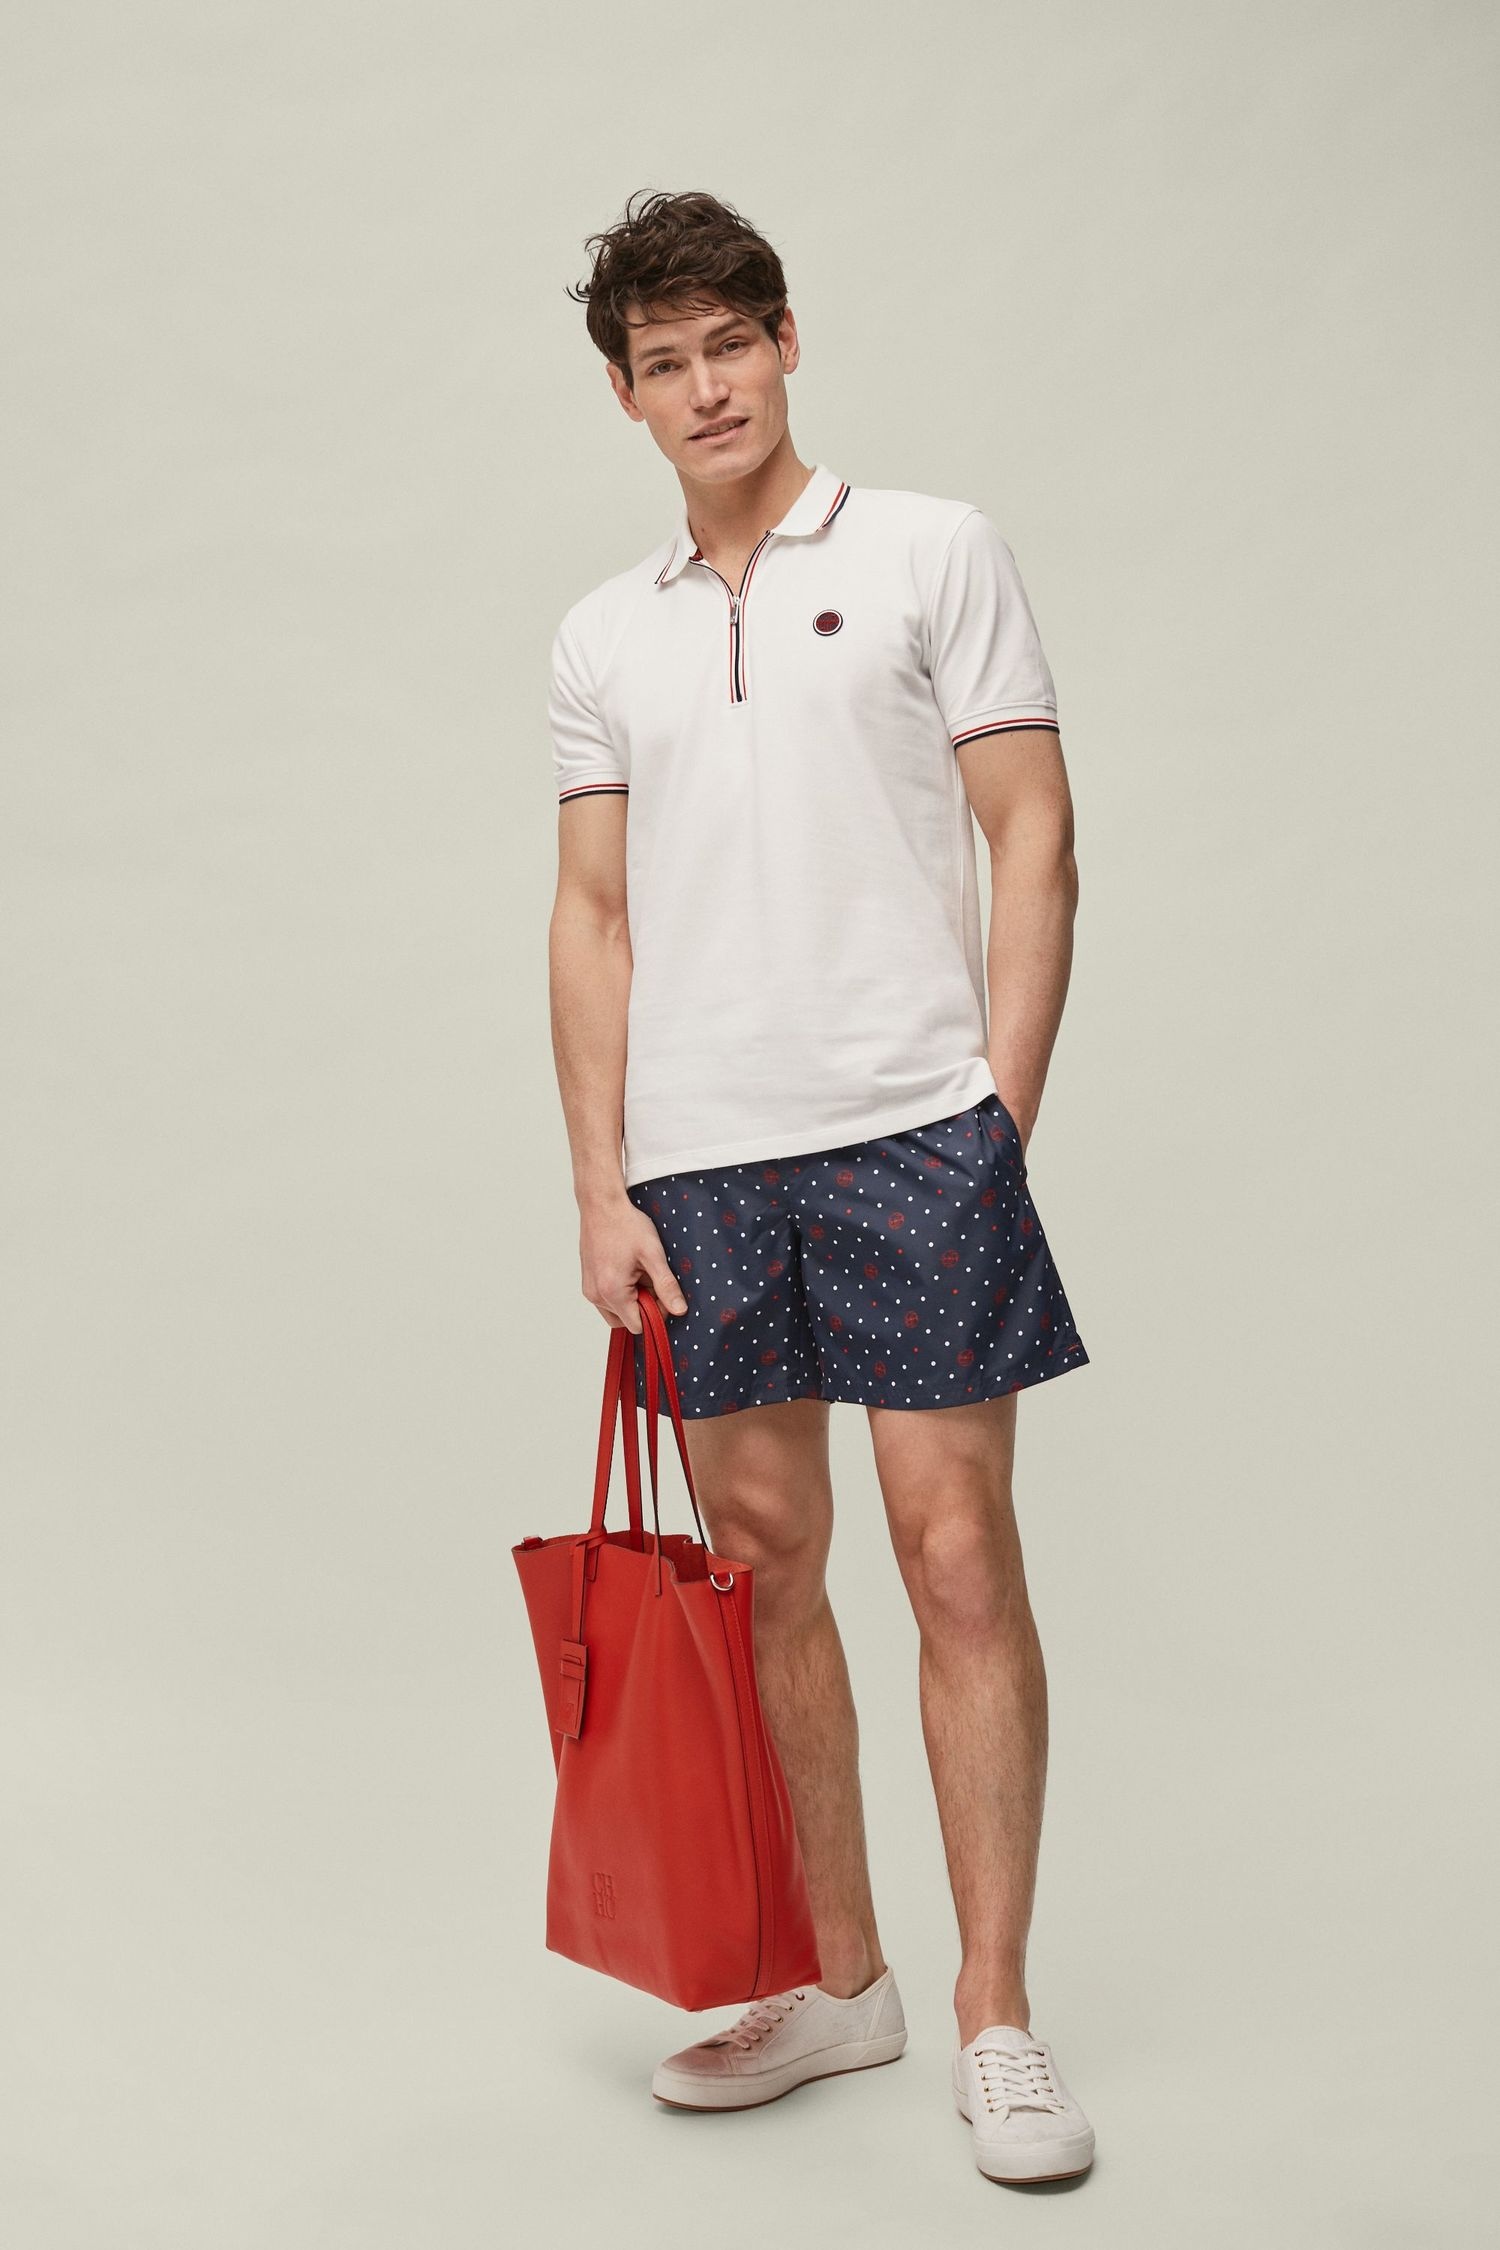 Polka dot swim shorts